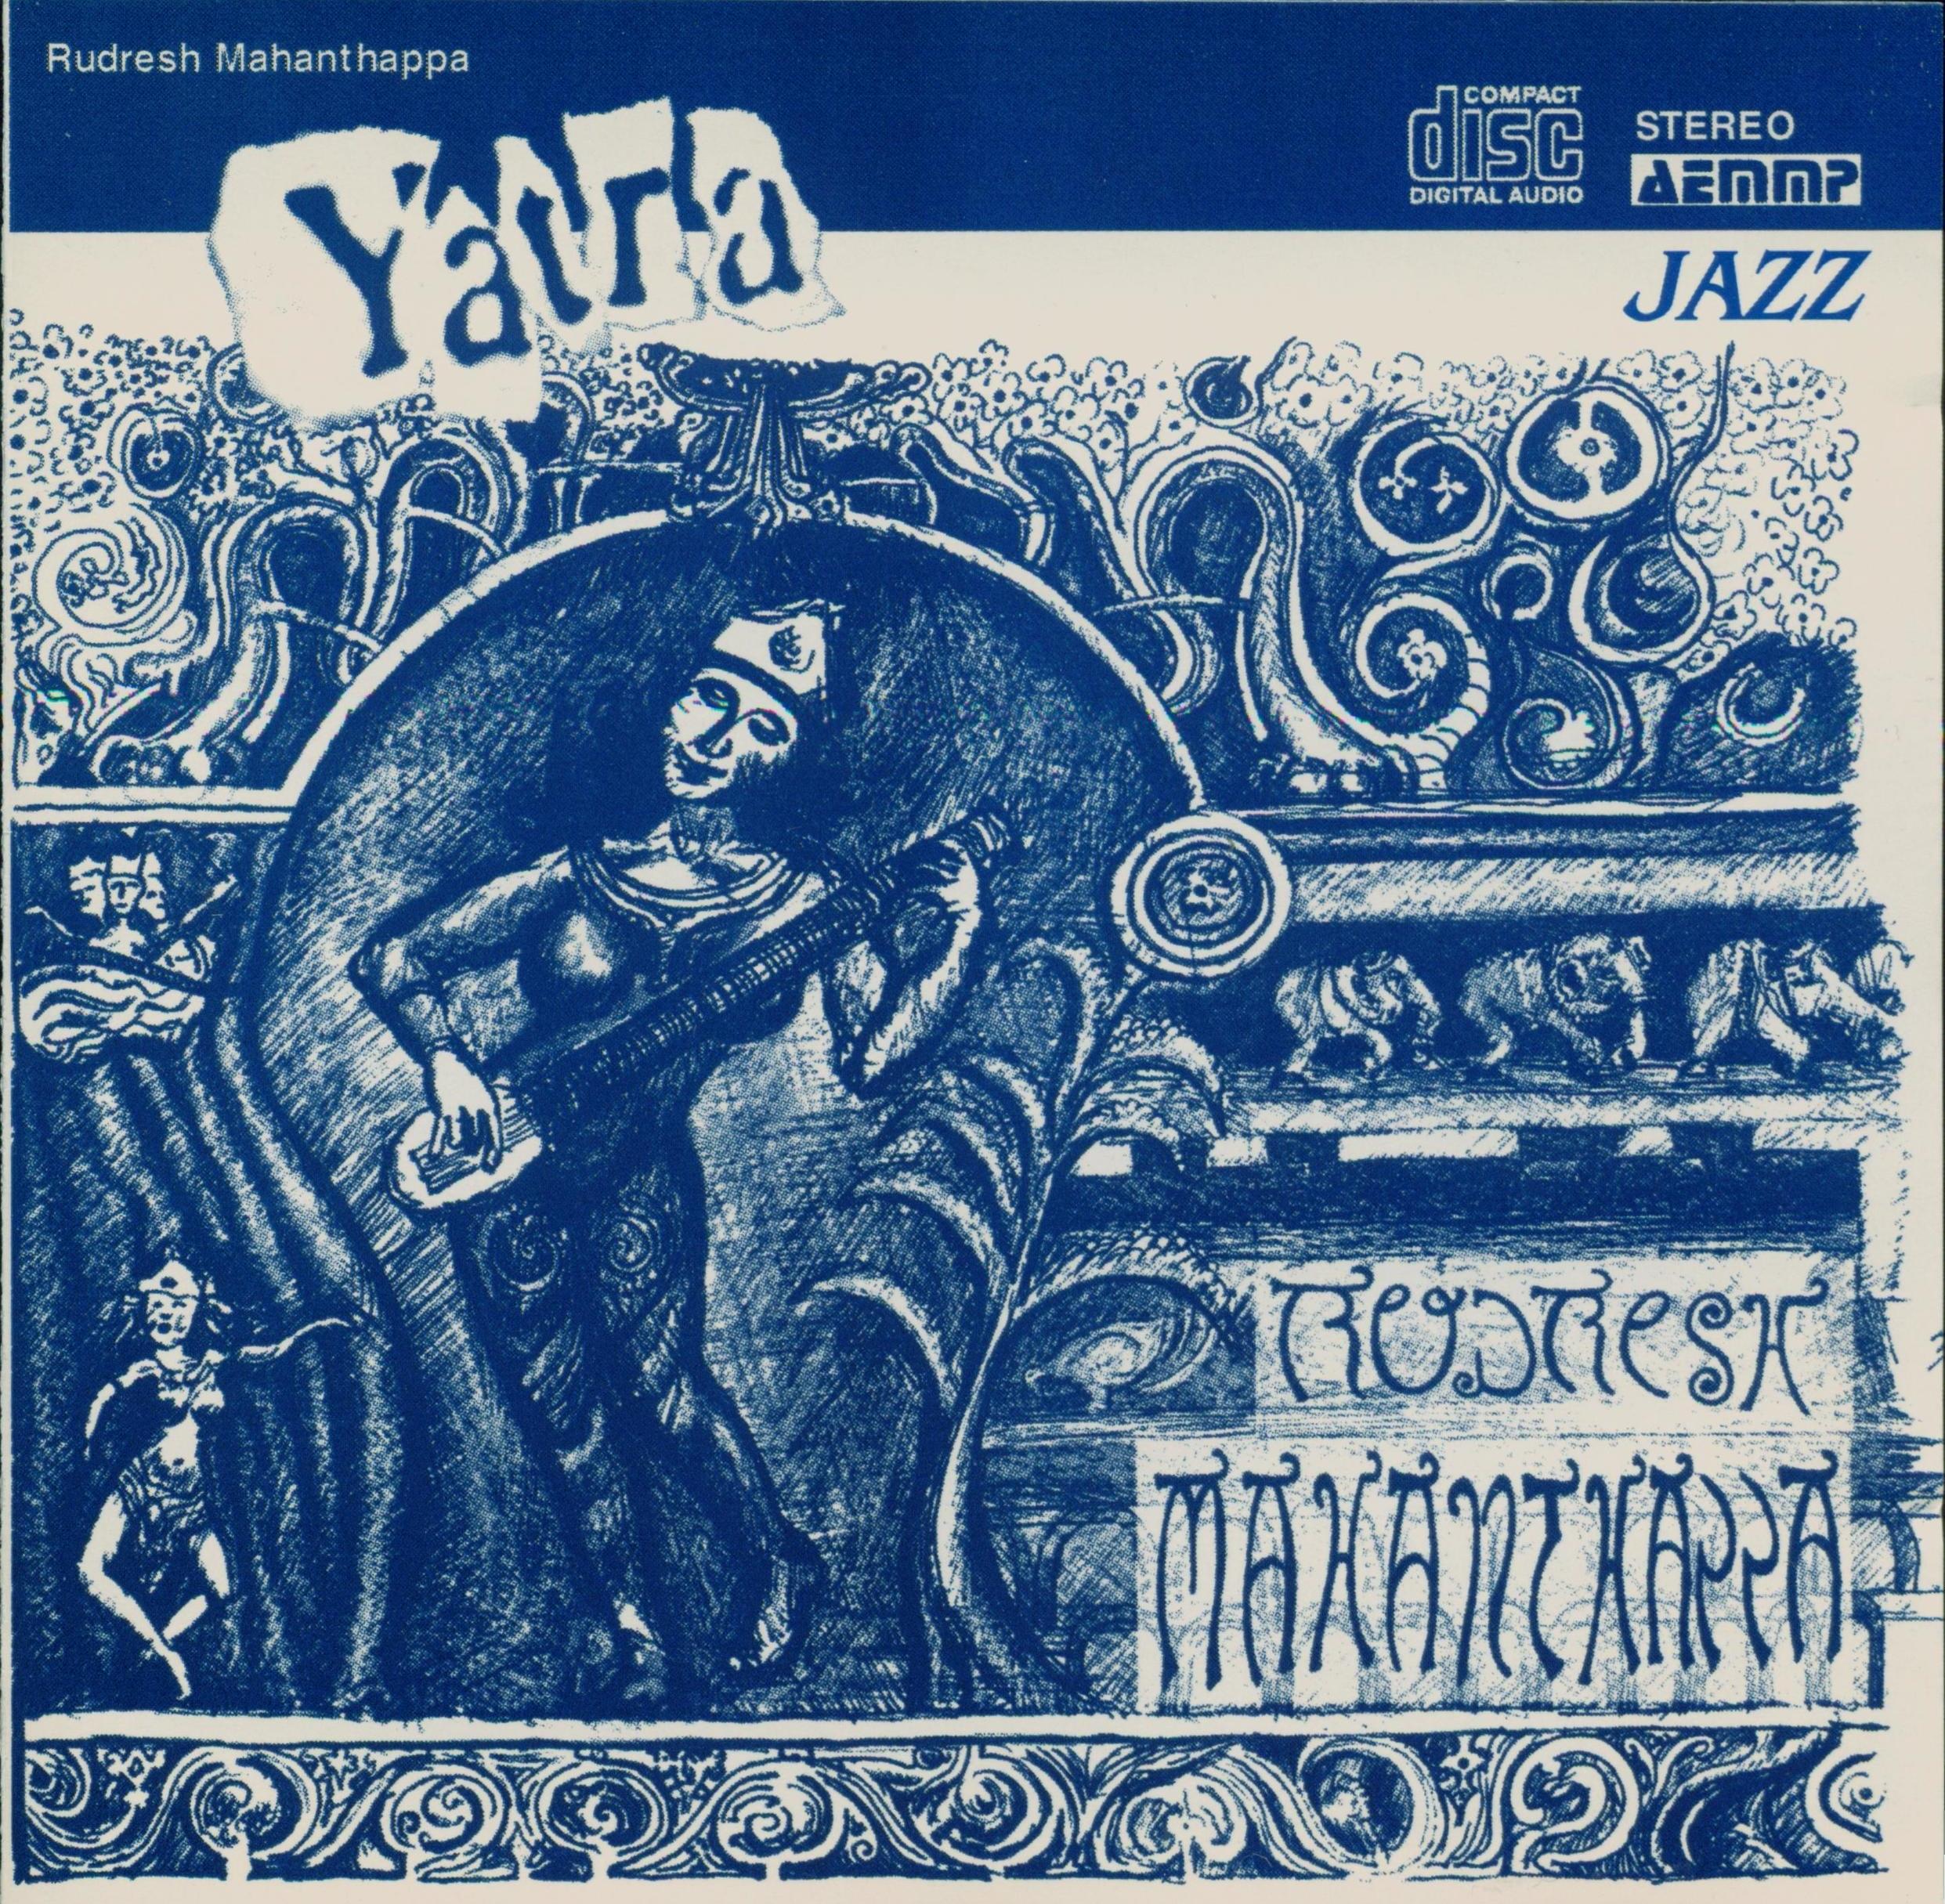 Rudresh Mahanthappa Yarta Album Artwork